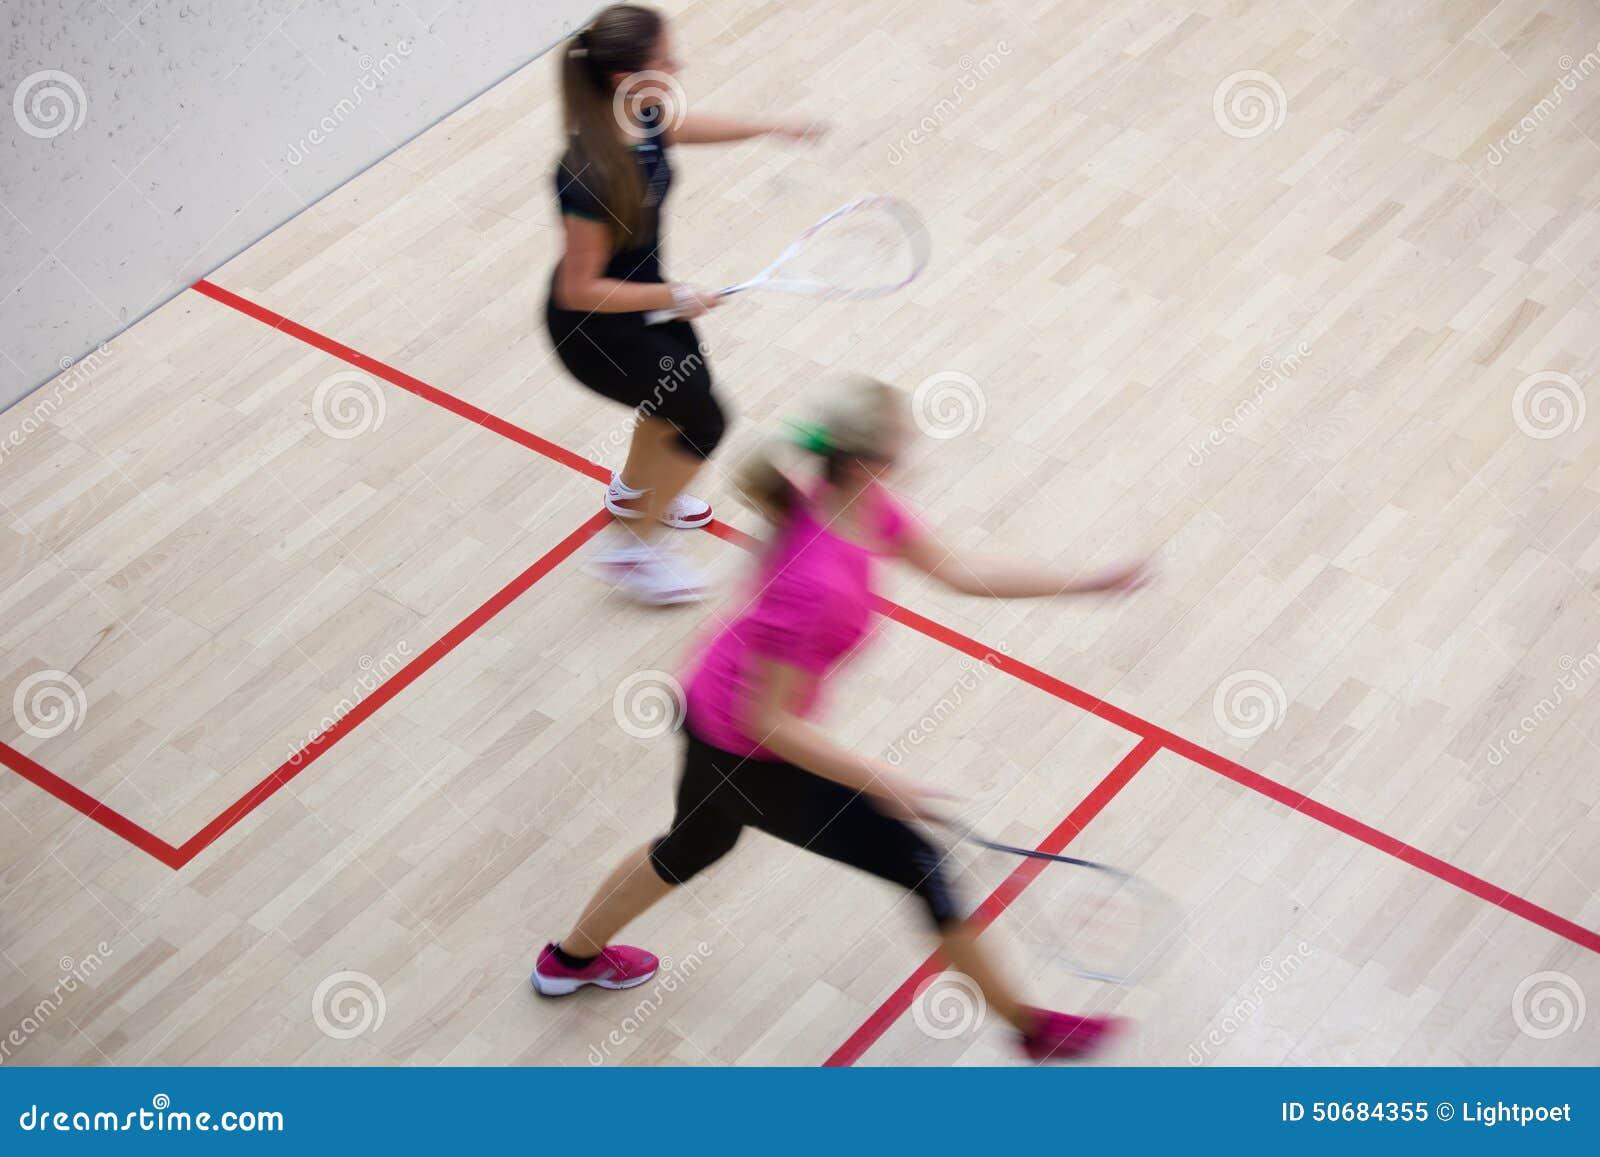 Download 快速的行动的两个女性南瓜球员对壁球球场 库存图片. 图片 包括有 执行, 爱好健美者, 成人, 室内, 表达式 - 50684355